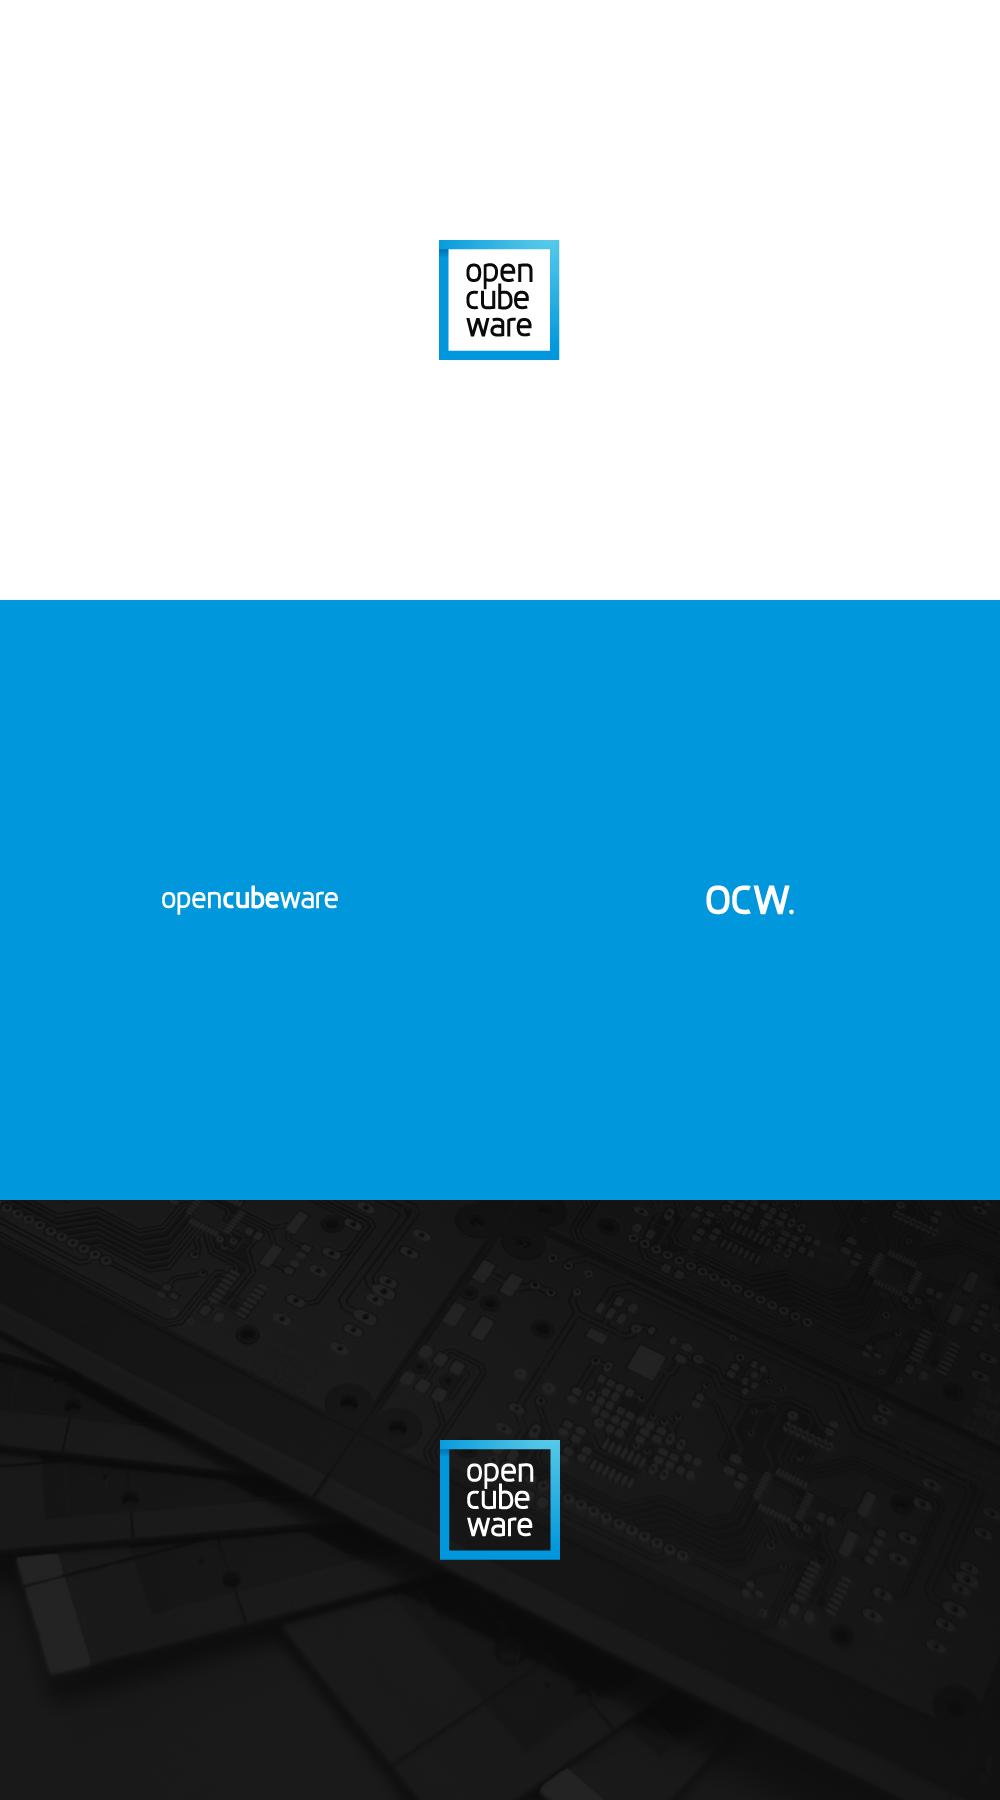 Opencubeware logo